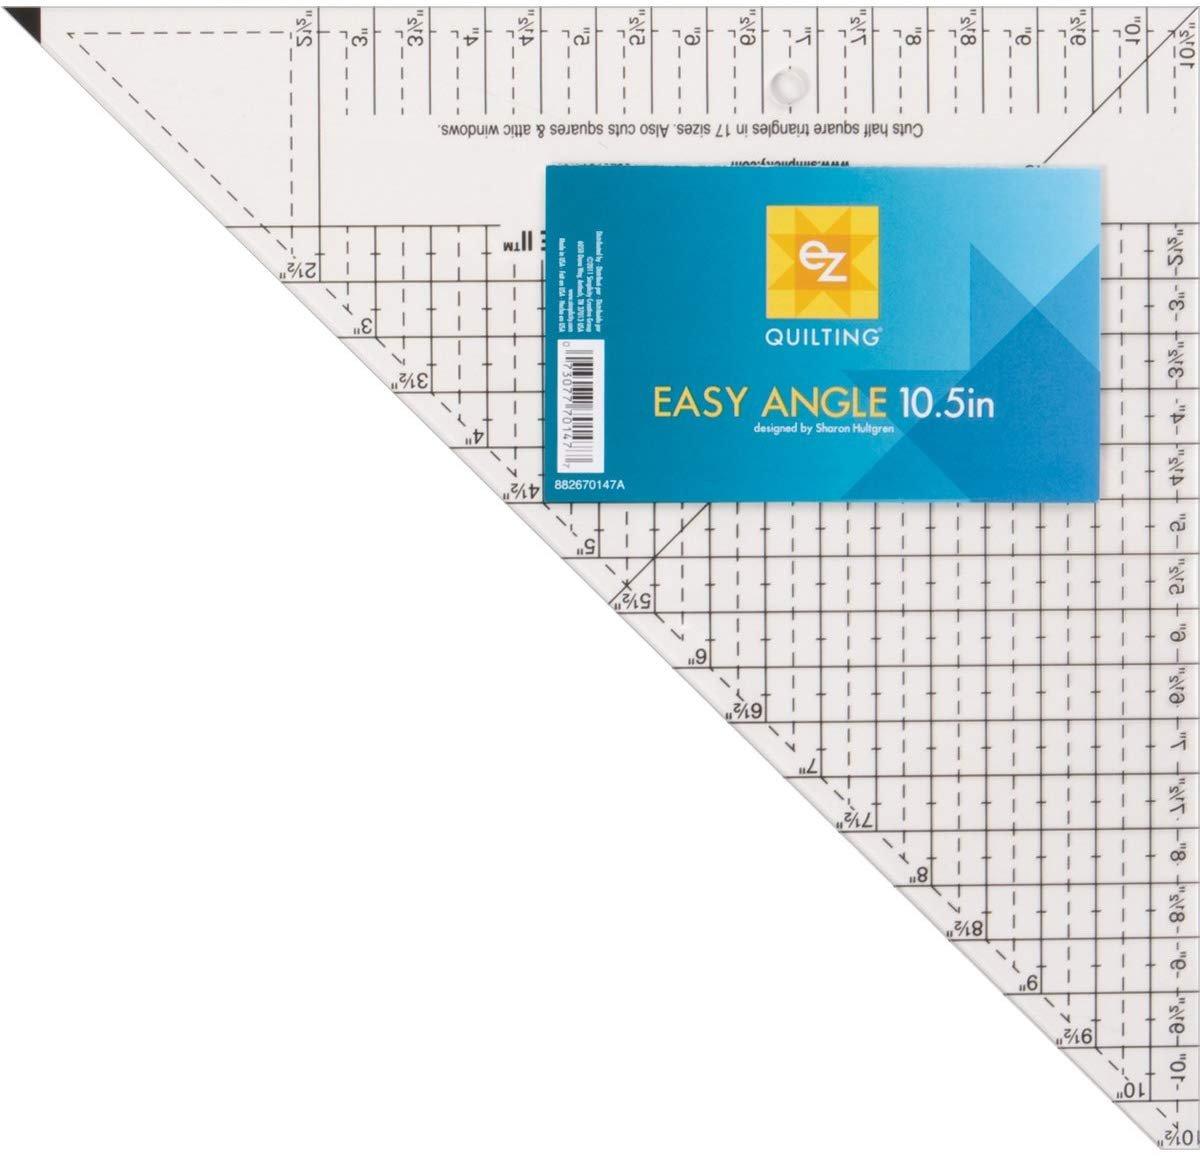 Easy Angle 10.5 Acrylic Template